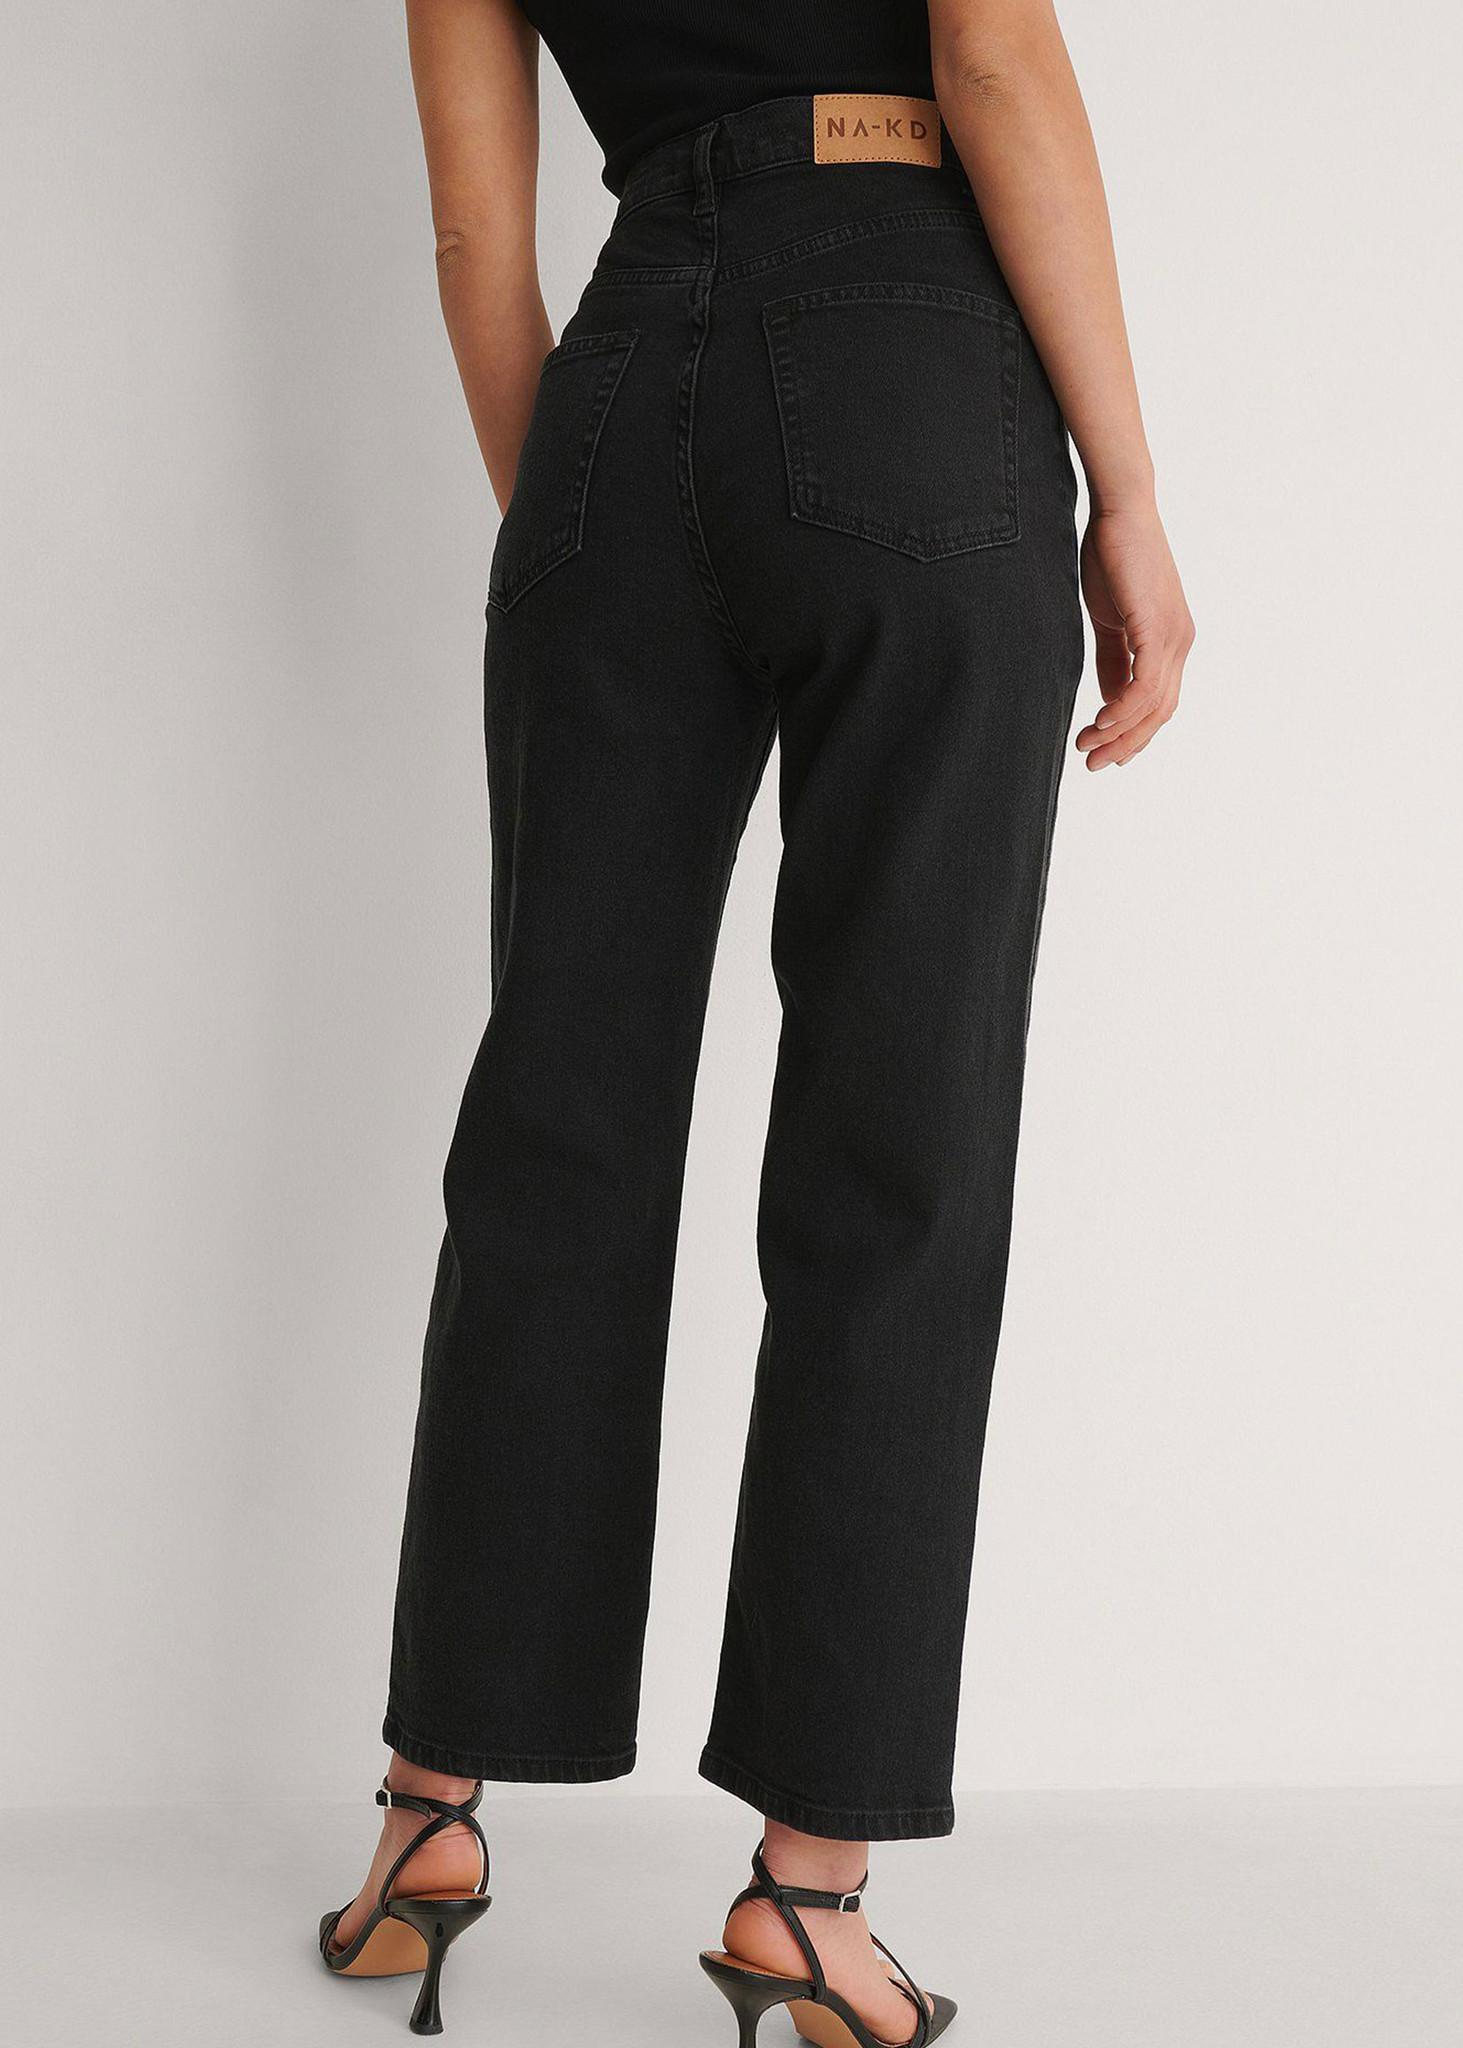 Straight High Waist Jeans Petite-2